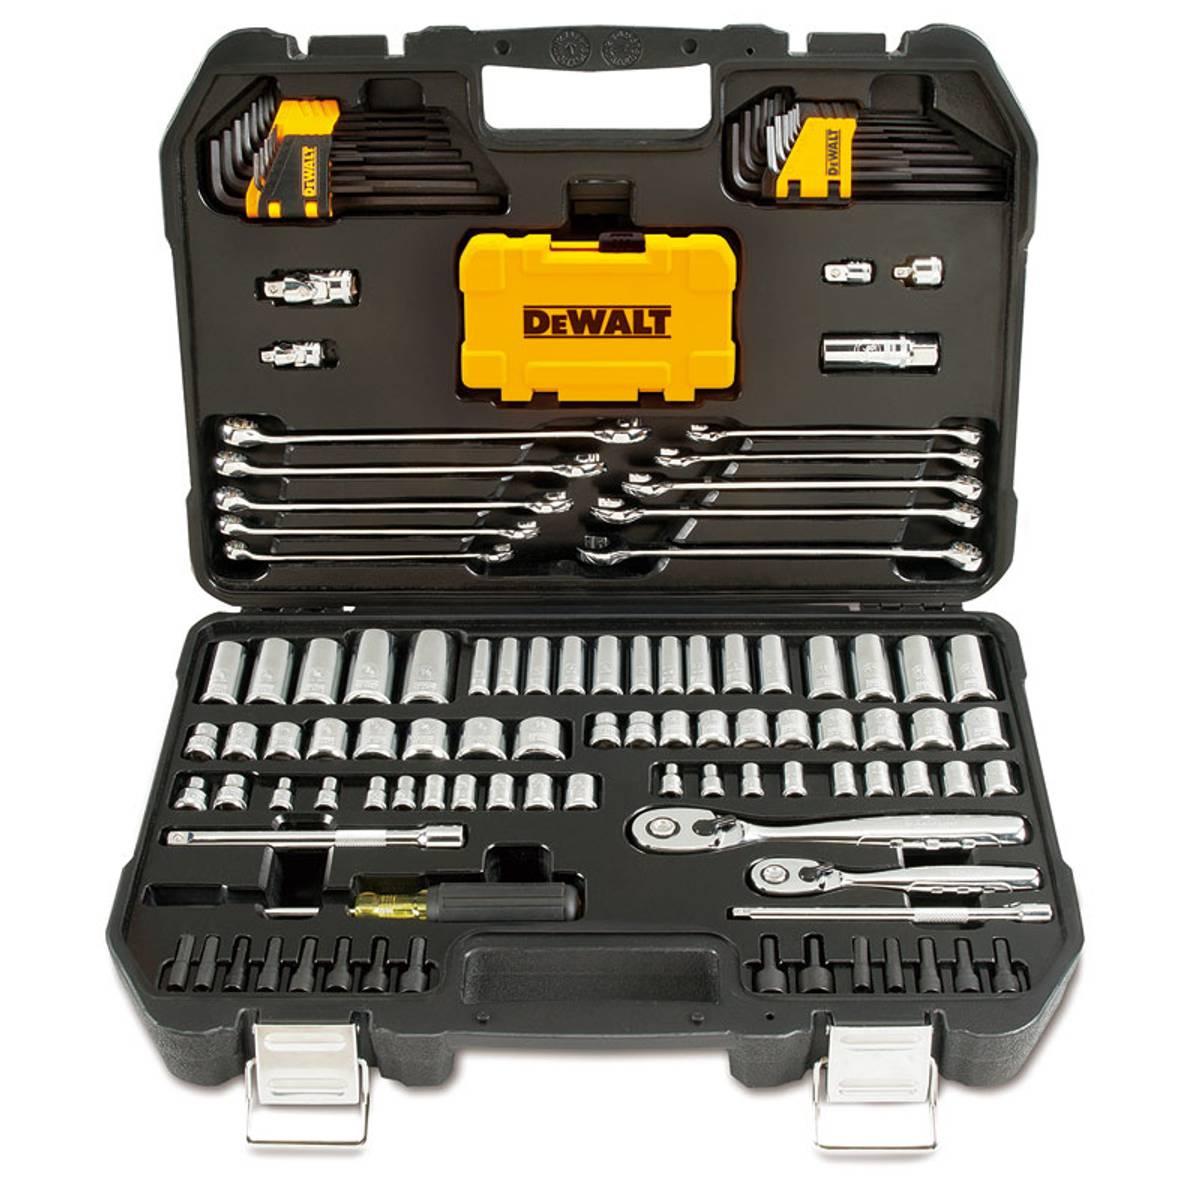 DEWALT 142 Piece Mechanic\'s Tool Set with Case